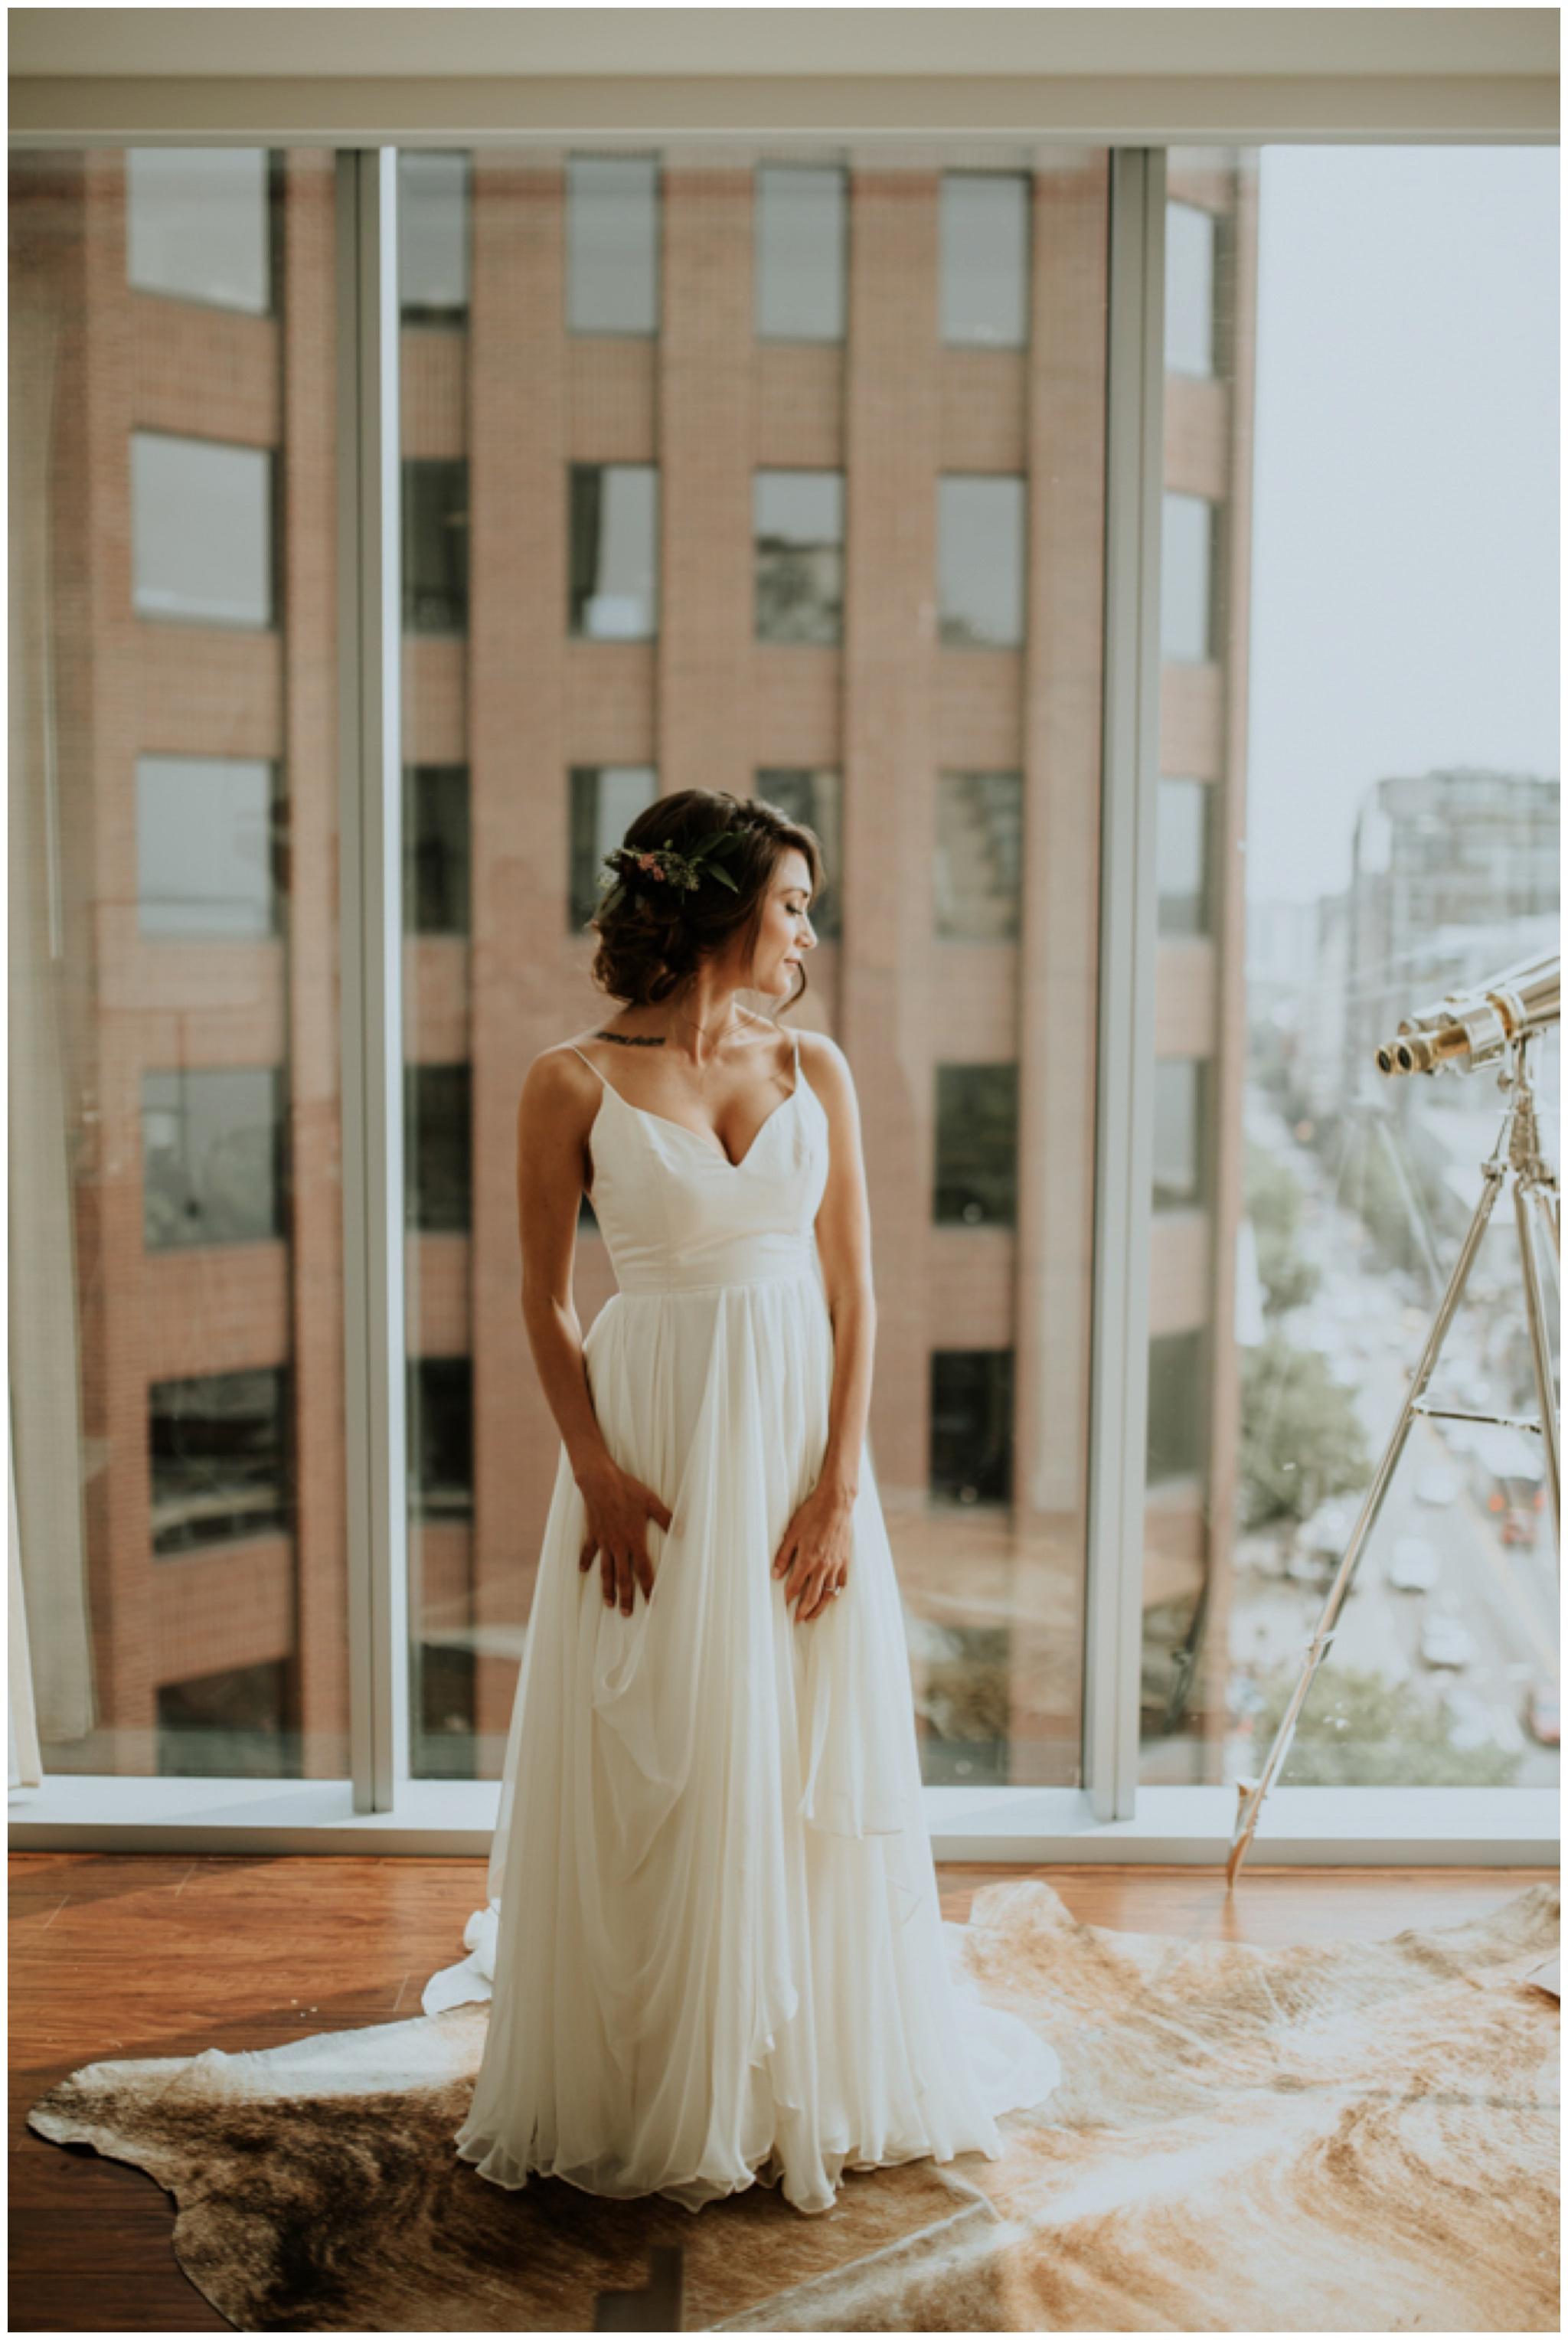 alyssa-keiran-westland-distillery-urban-seattle-wedding-photographer-caitlyn-nikula-39.jpg